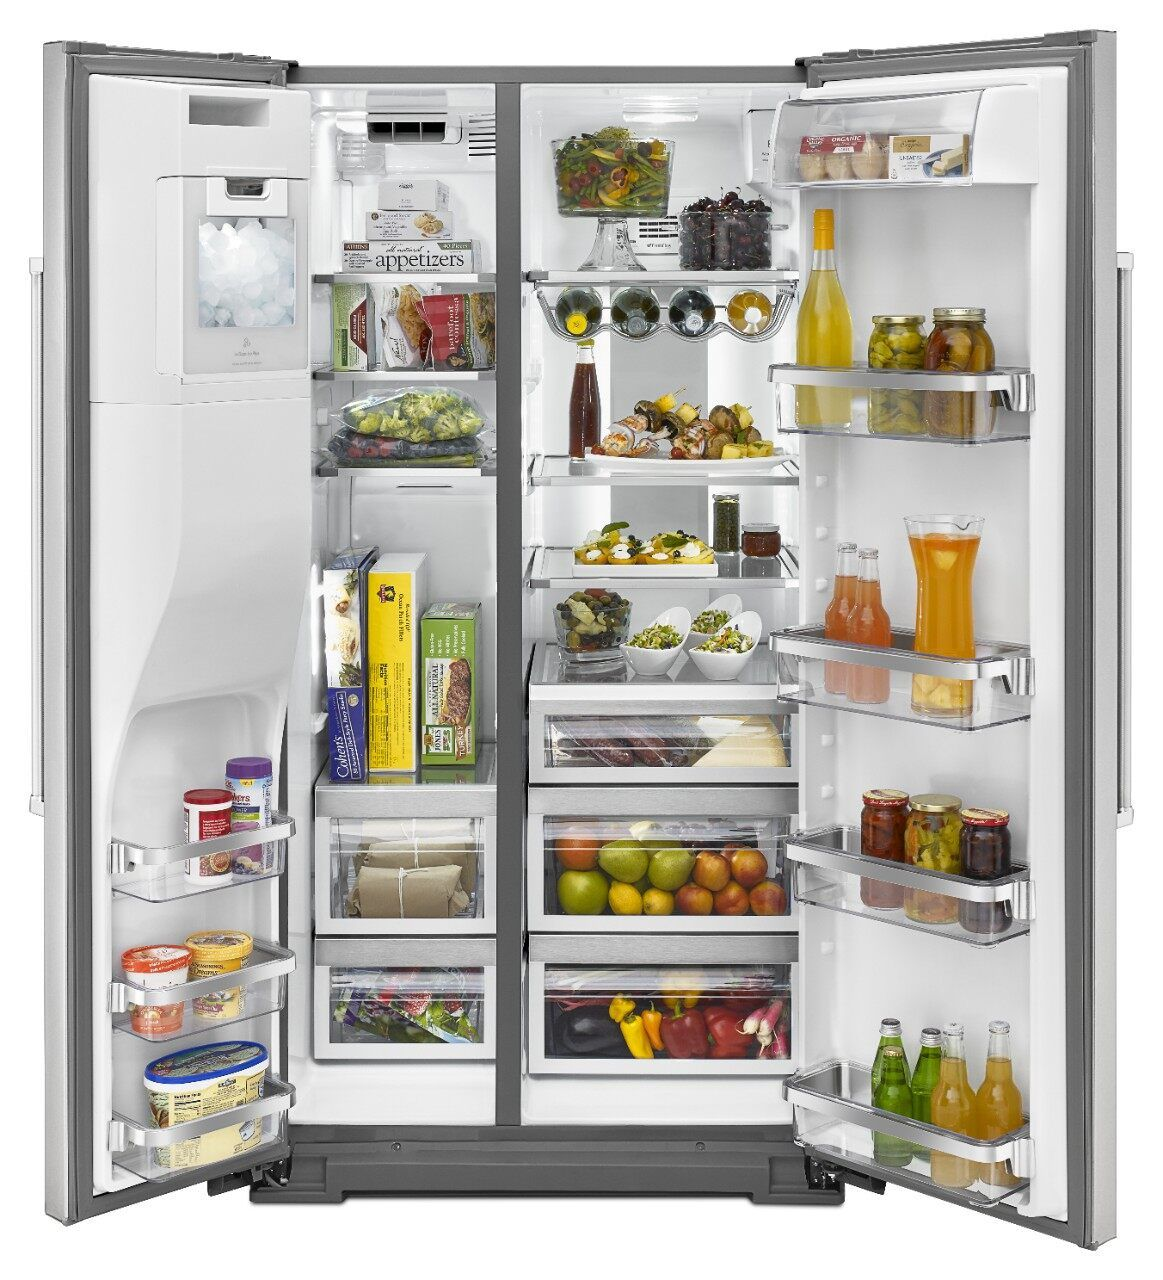 Find a new sidebyside fridge at KitchenAid. in 2020